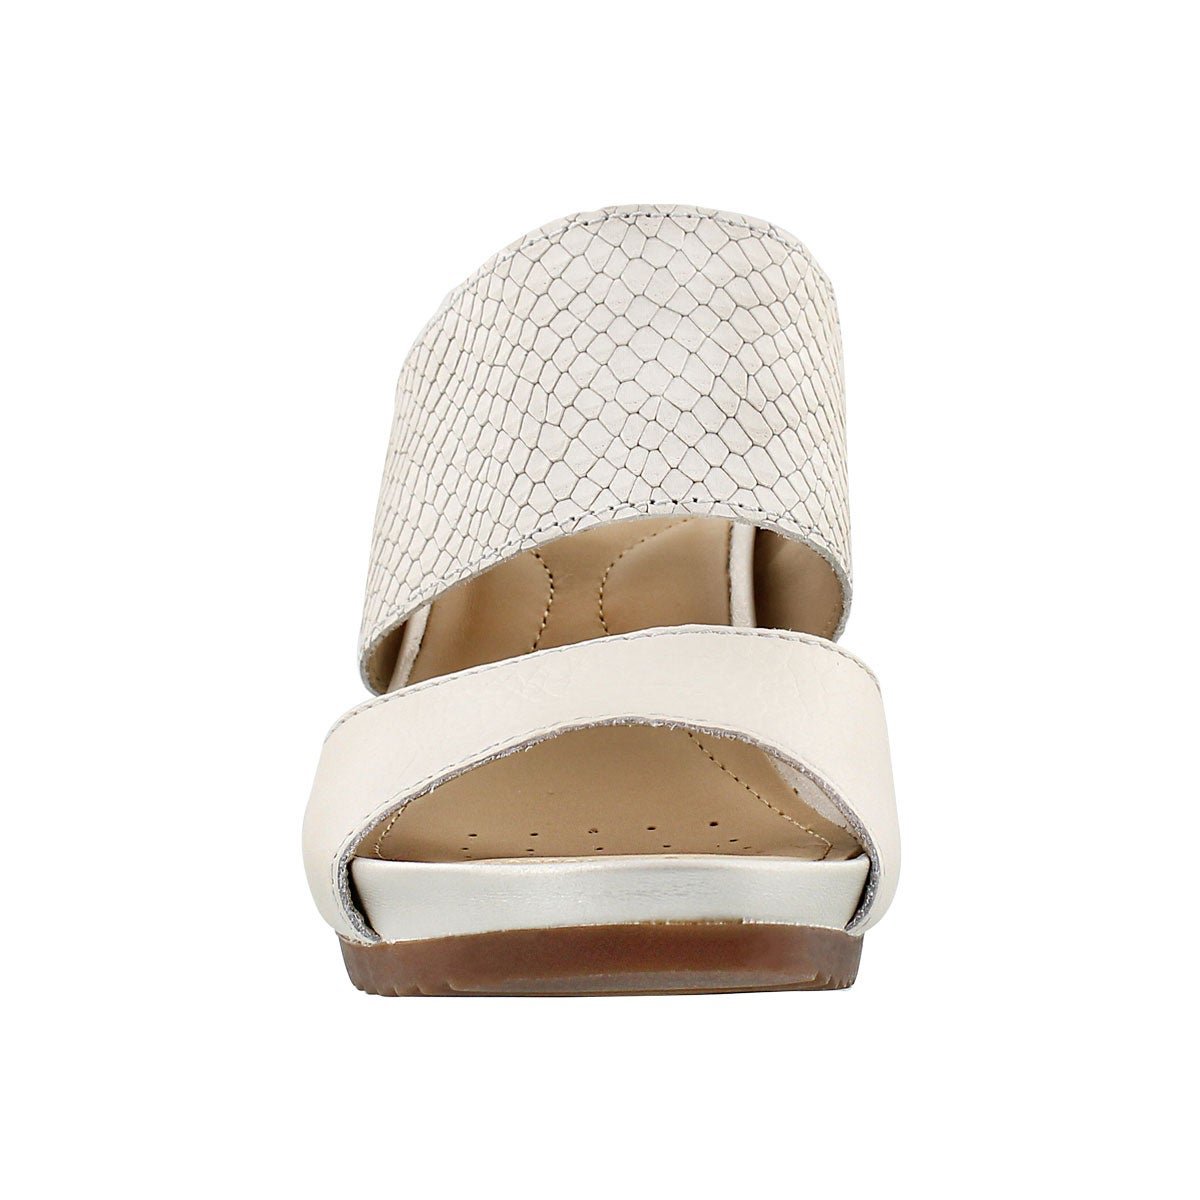 Sandale talon comp NEW RORIE, blanc, fem